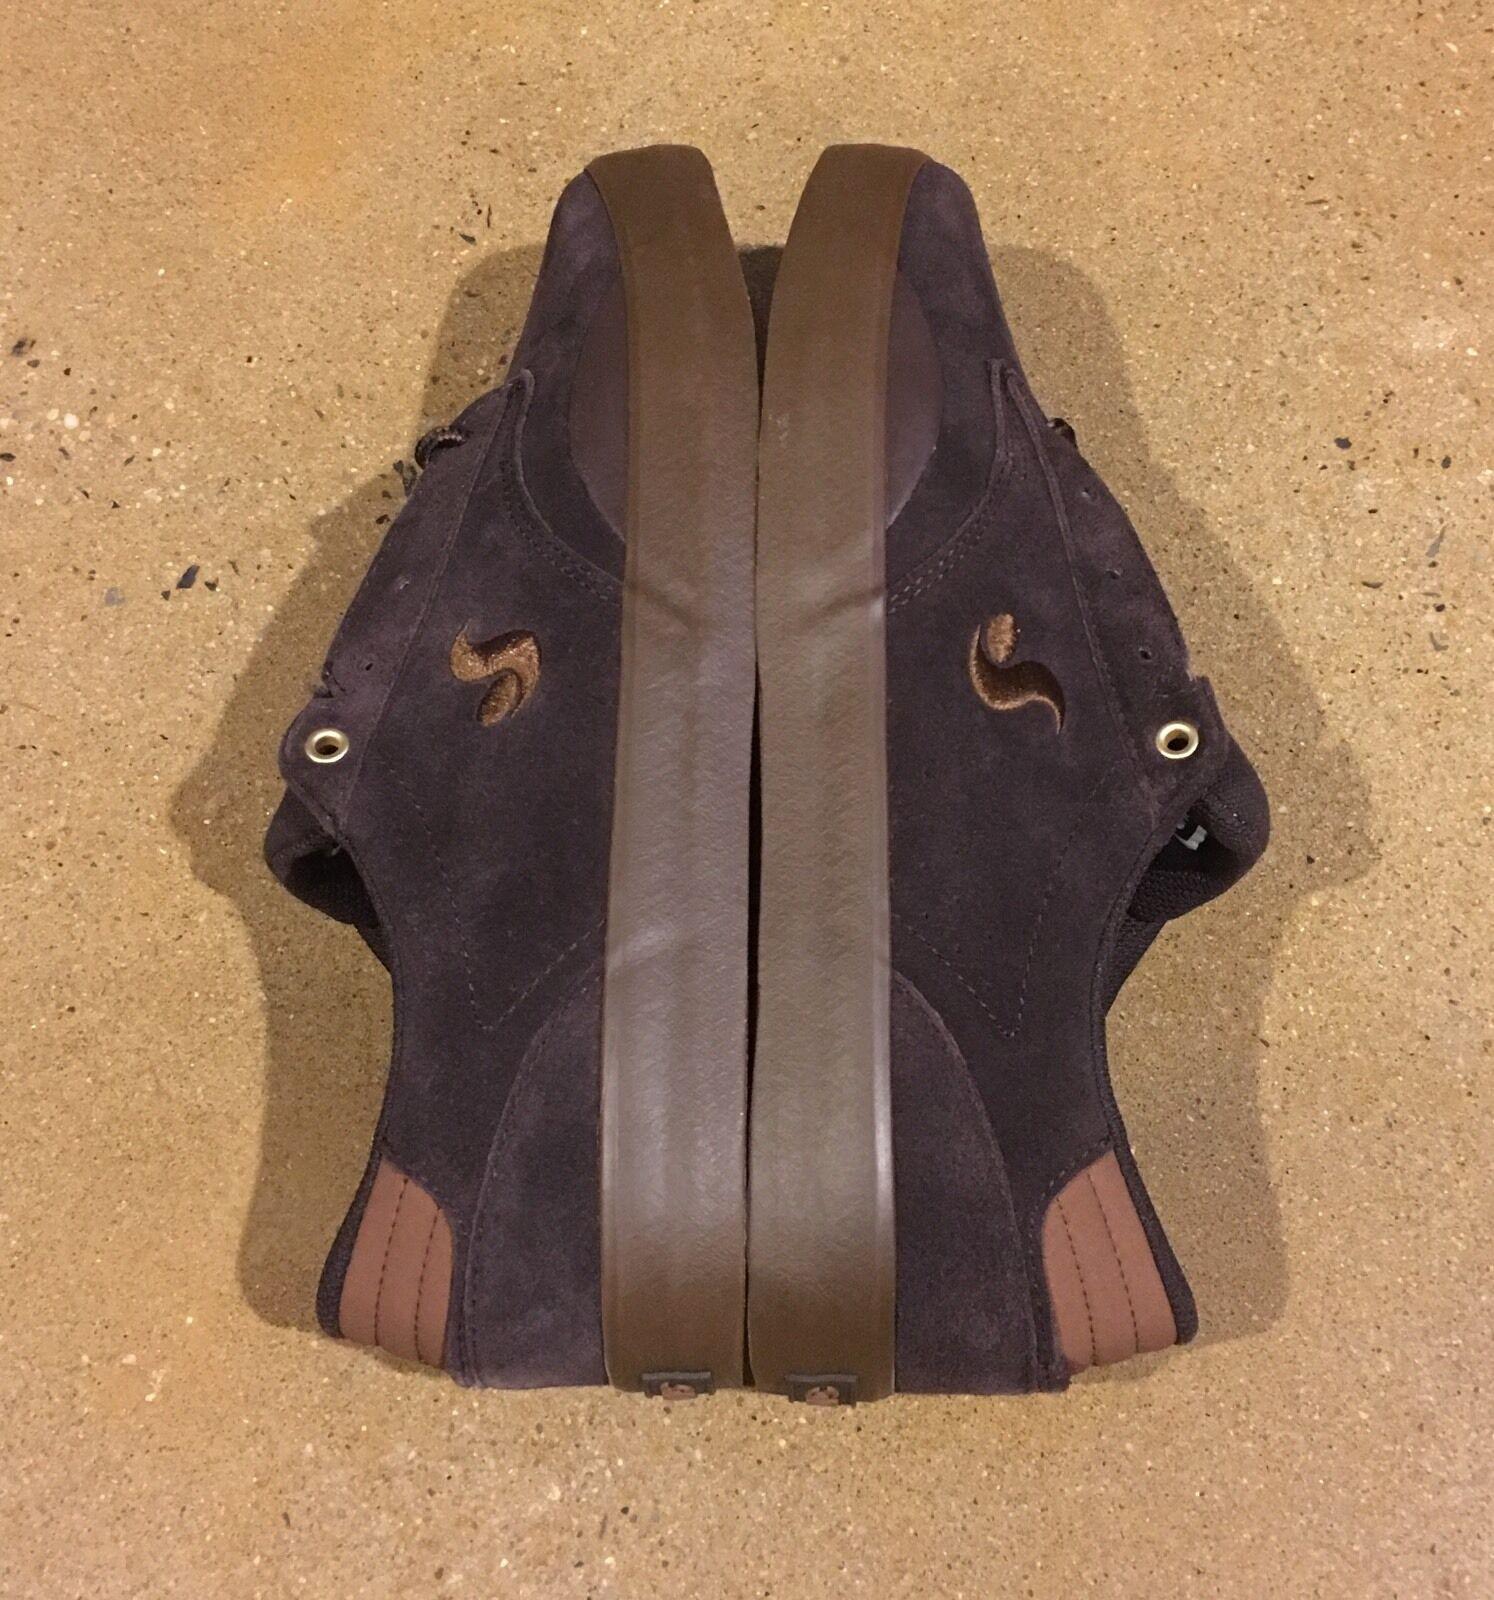 DVS Daewon 14 Coffee Suede Size 10 BMX DC Skate Shoes Sneakers Daewon Song Scarpe classiche da uomo